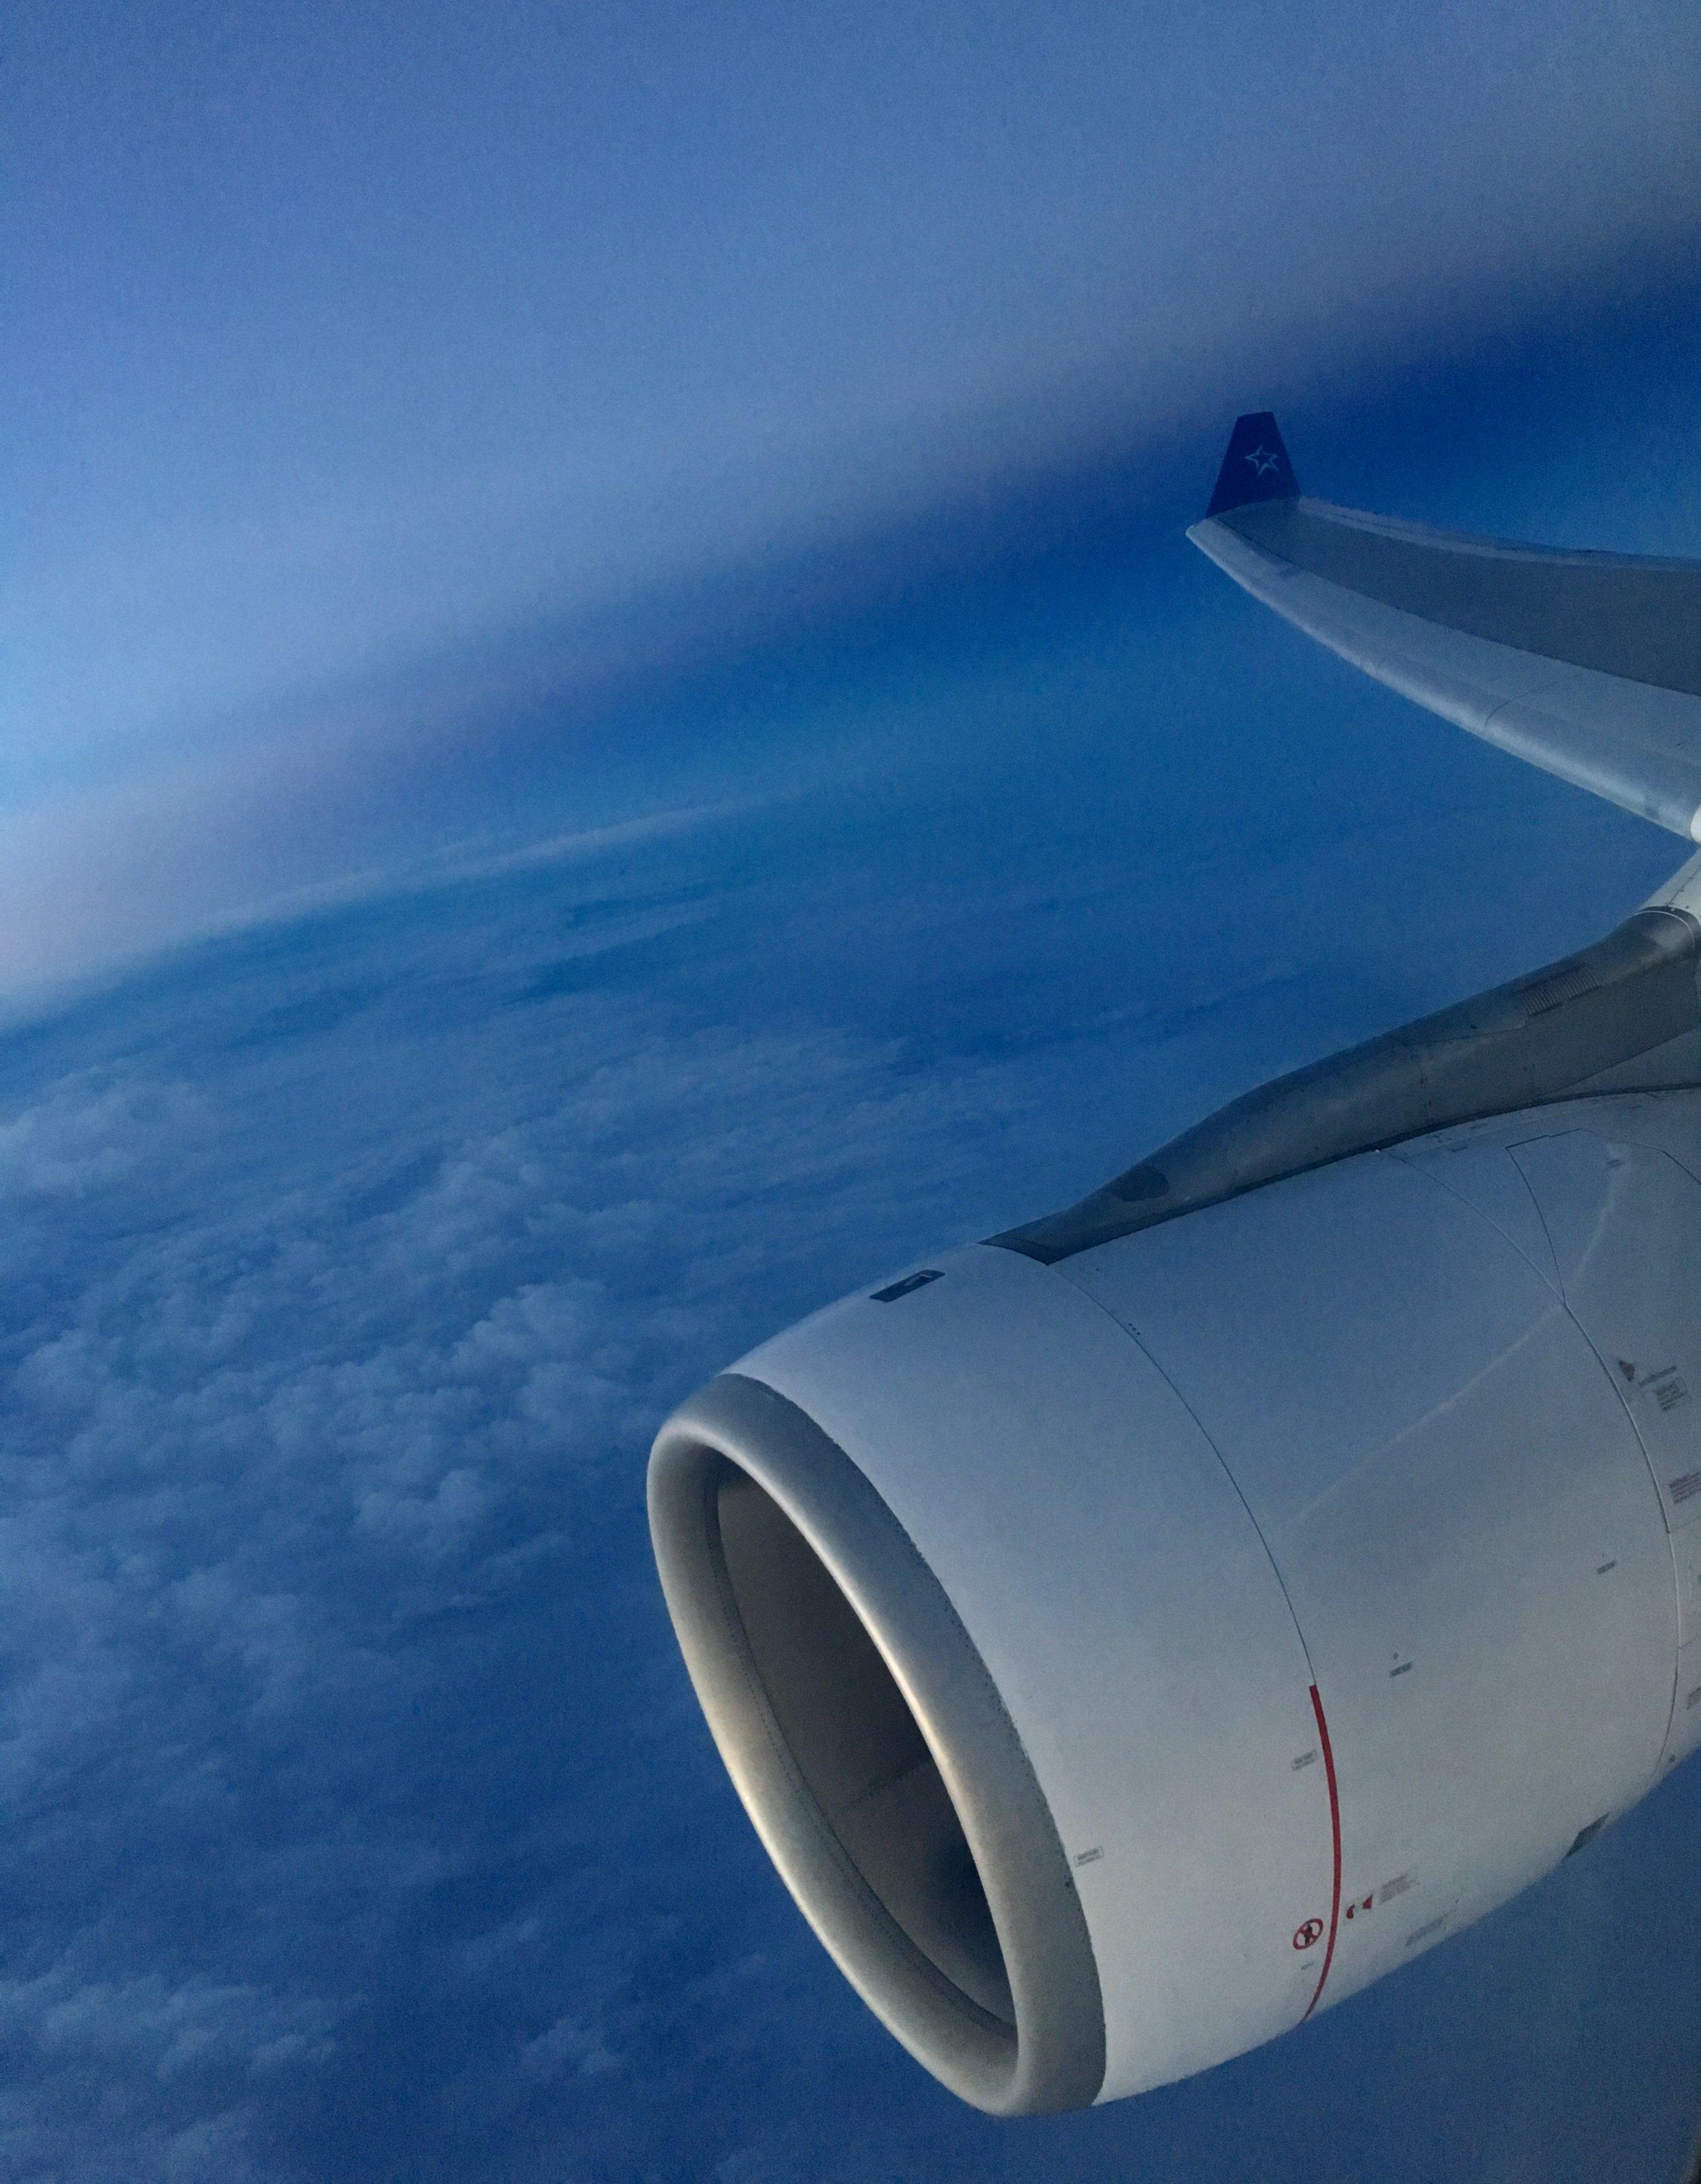 AirTransat - Airbus A330